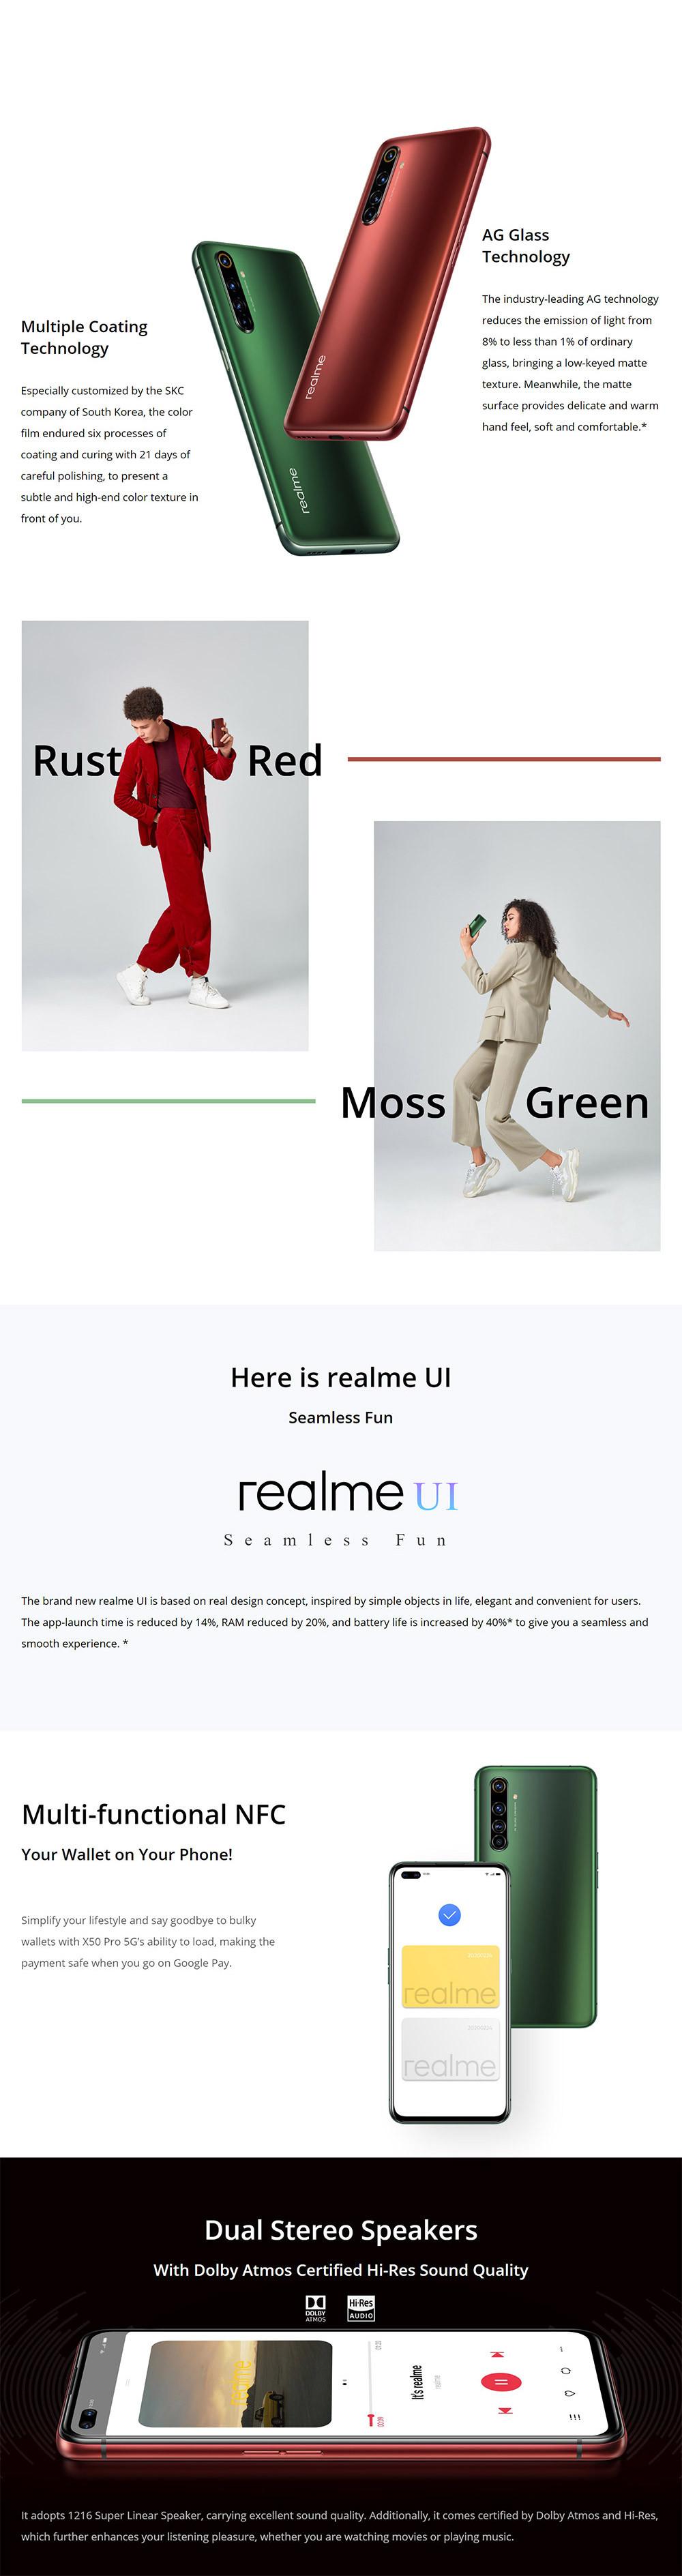 realme-x50-pro-5g-2_2.jpg